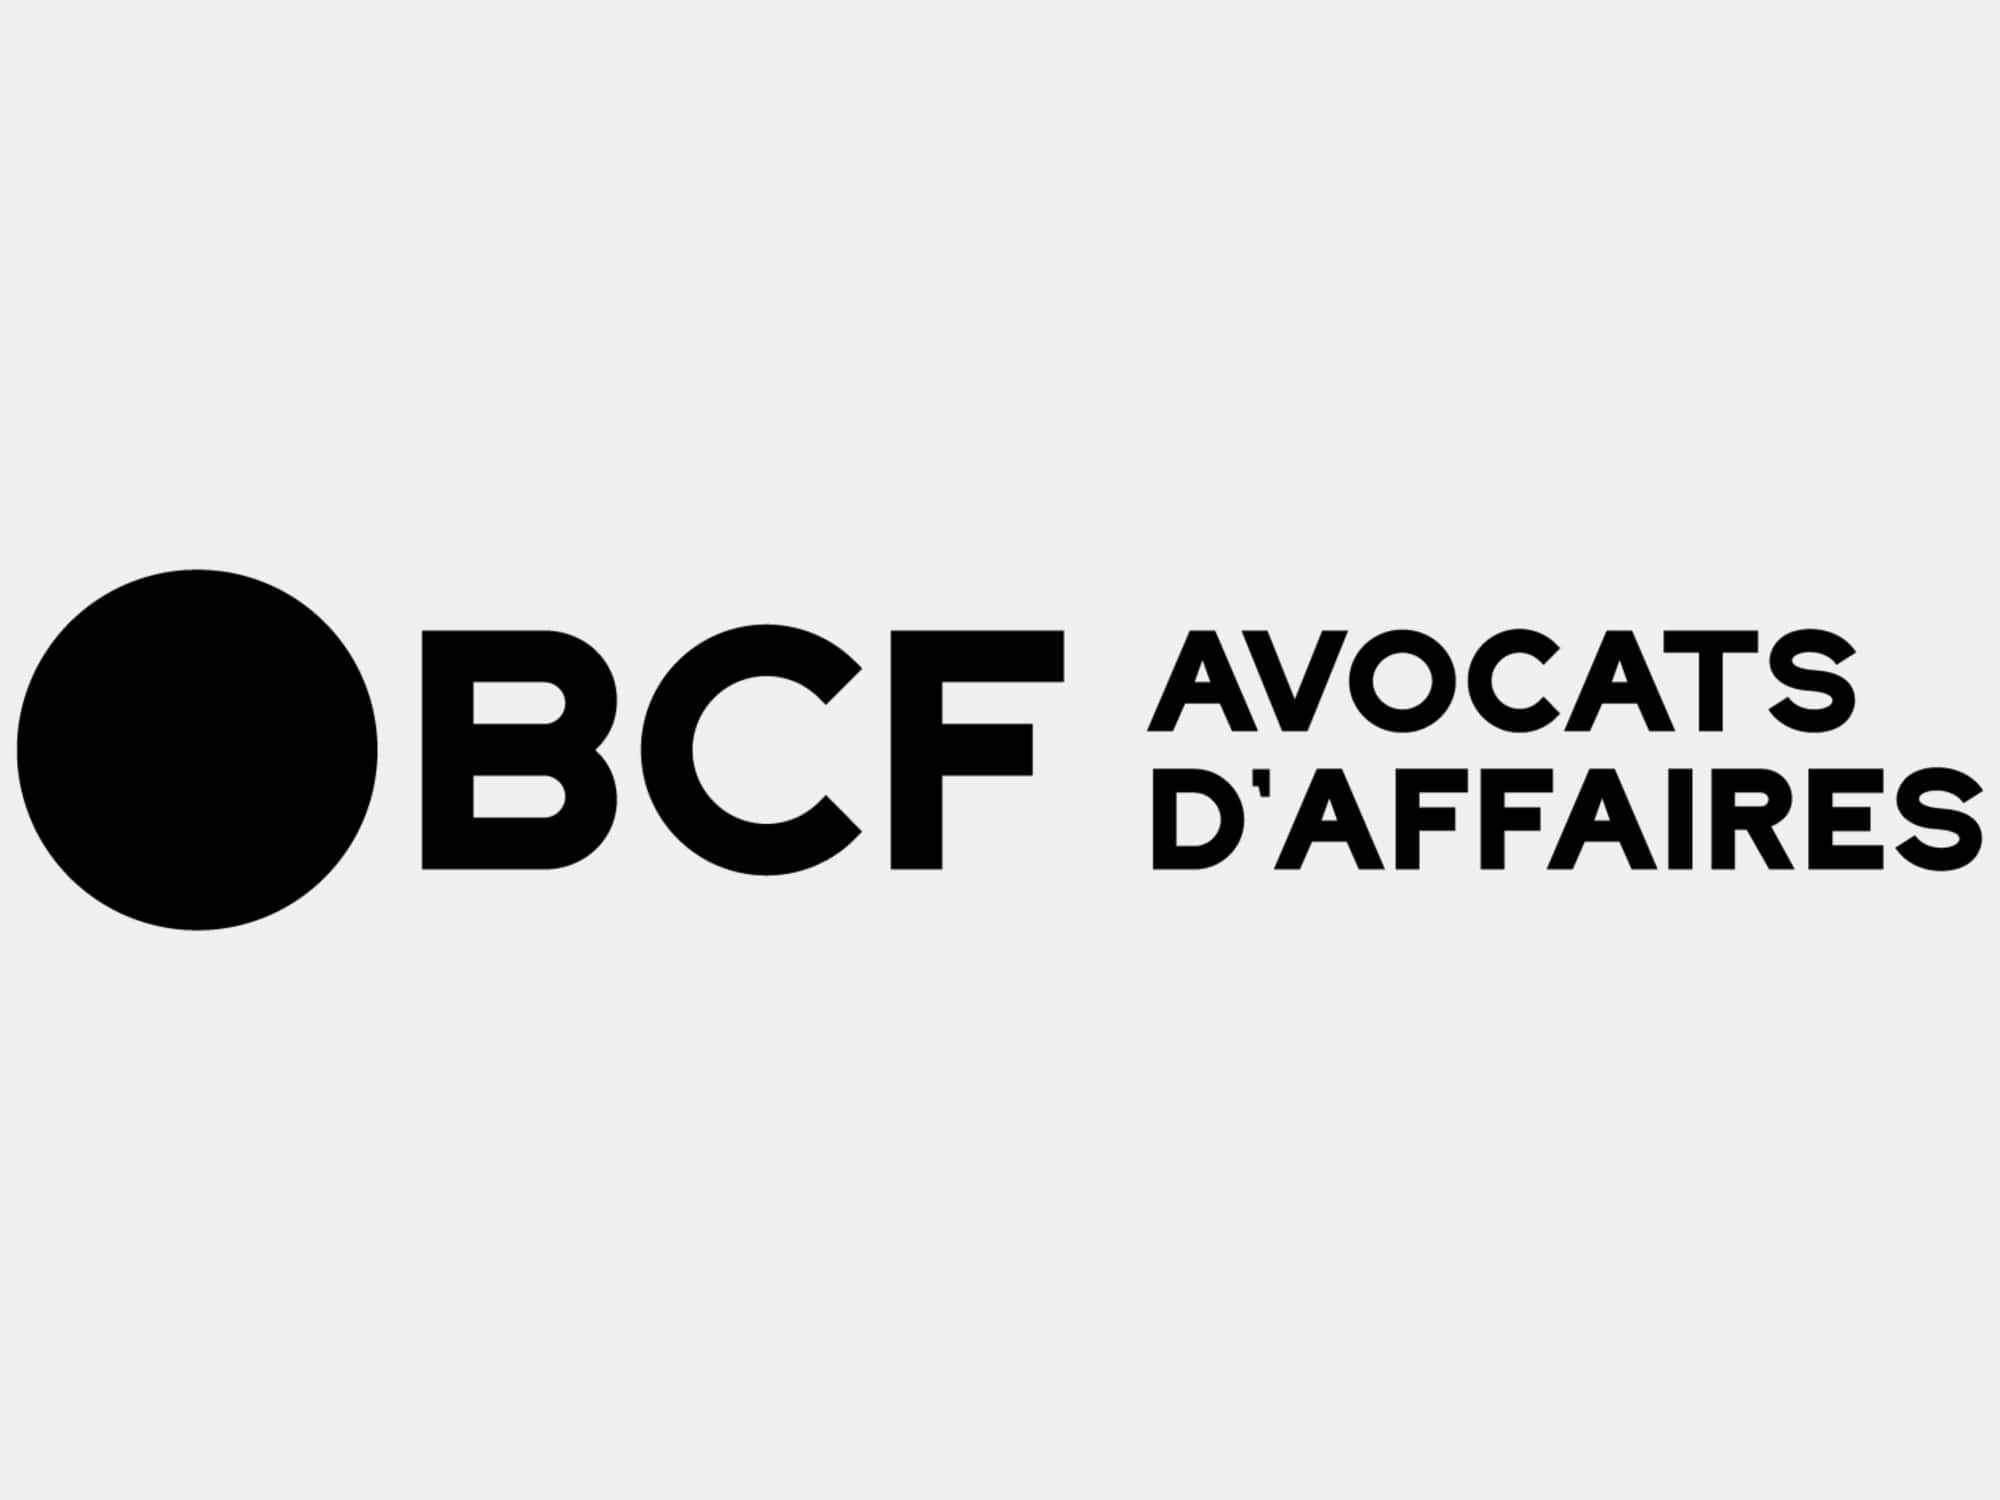 BCF Avocats d'affaires.jpg